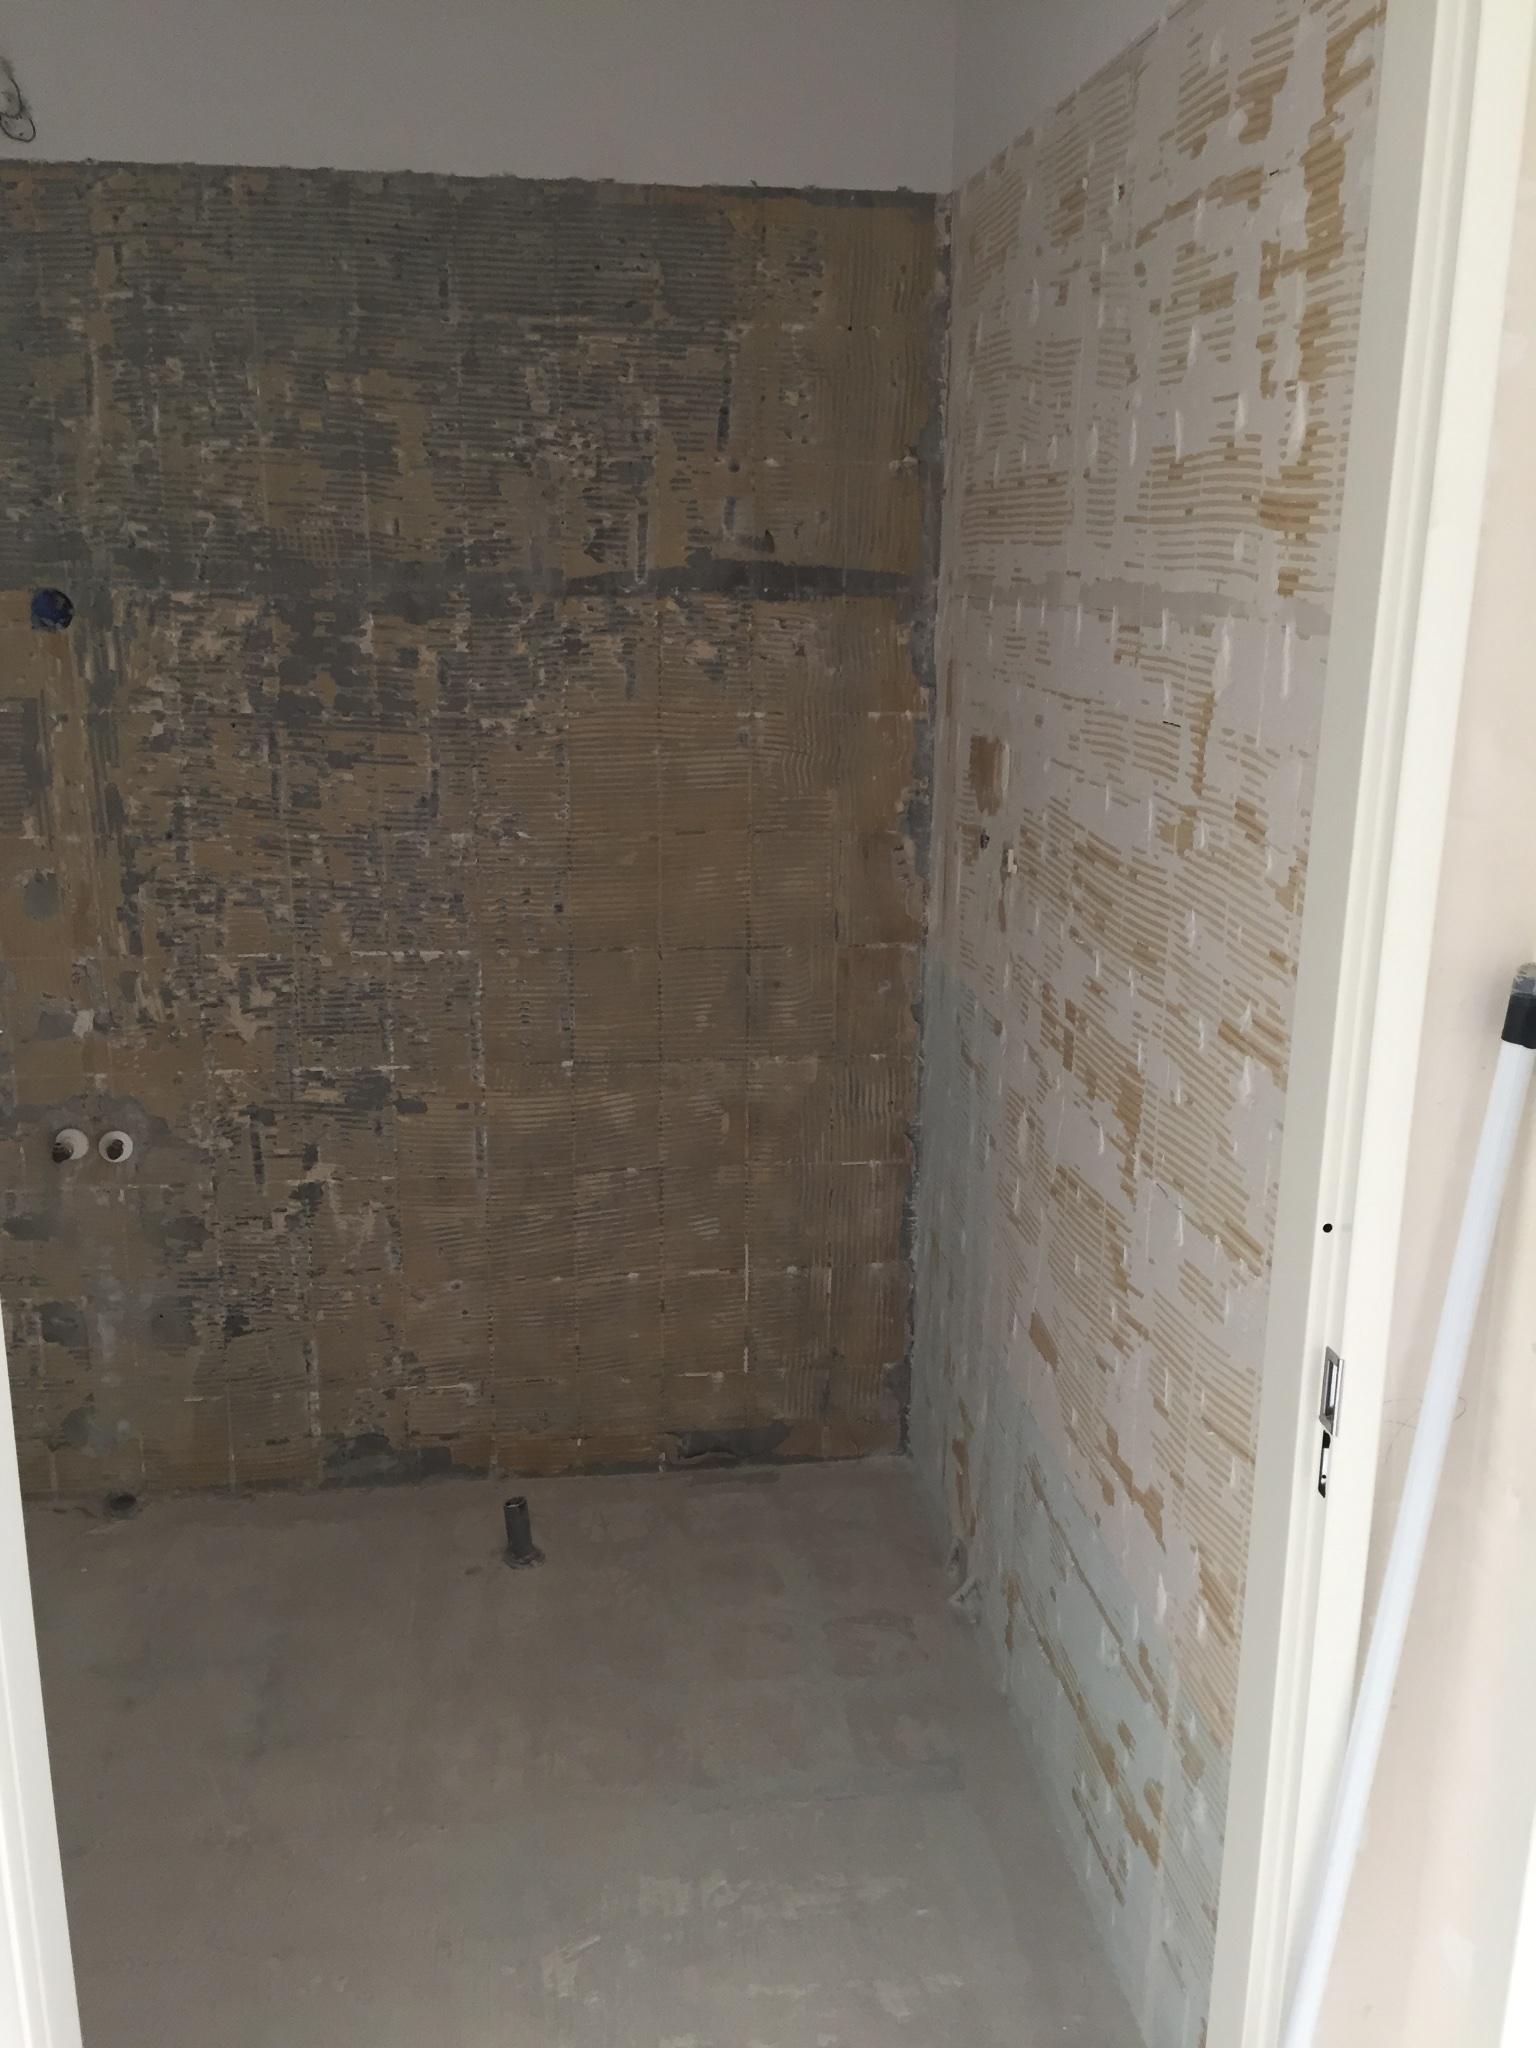 waterleiding verleggen en afdoppen waterleiding in badkamer - werkspot